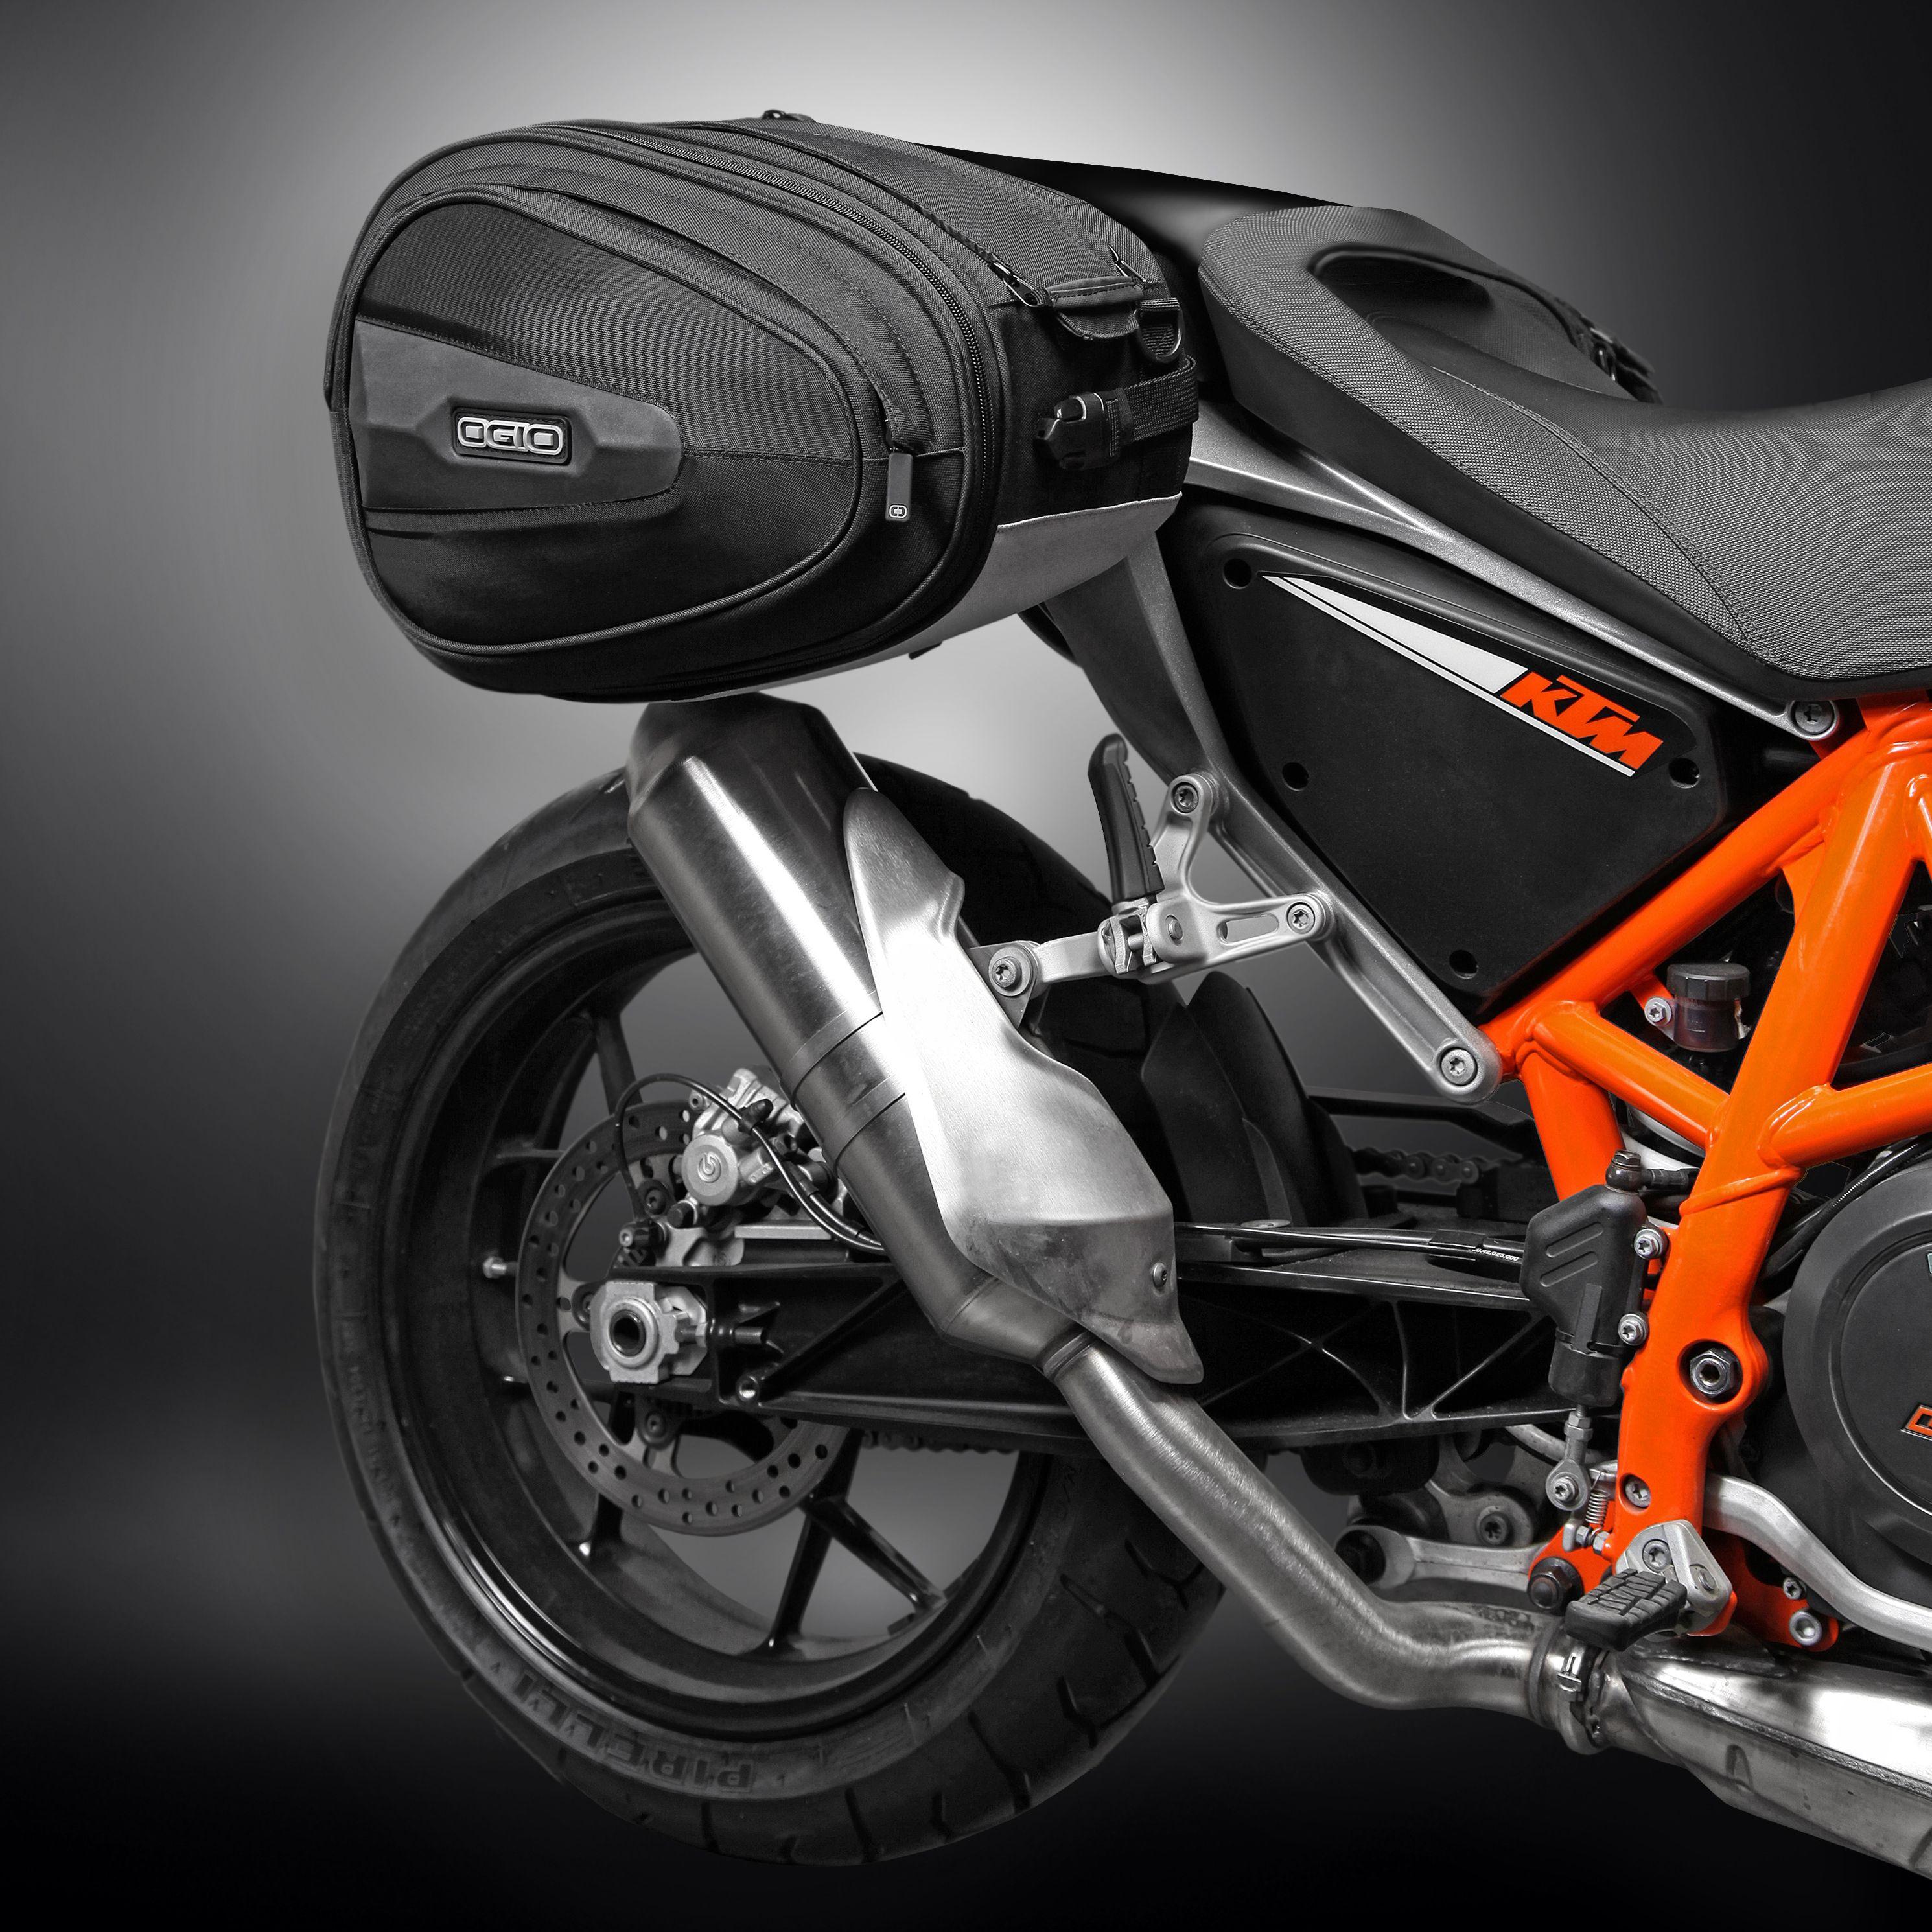 Saddle Bag Street Bike Moto Bag Collection Powersports